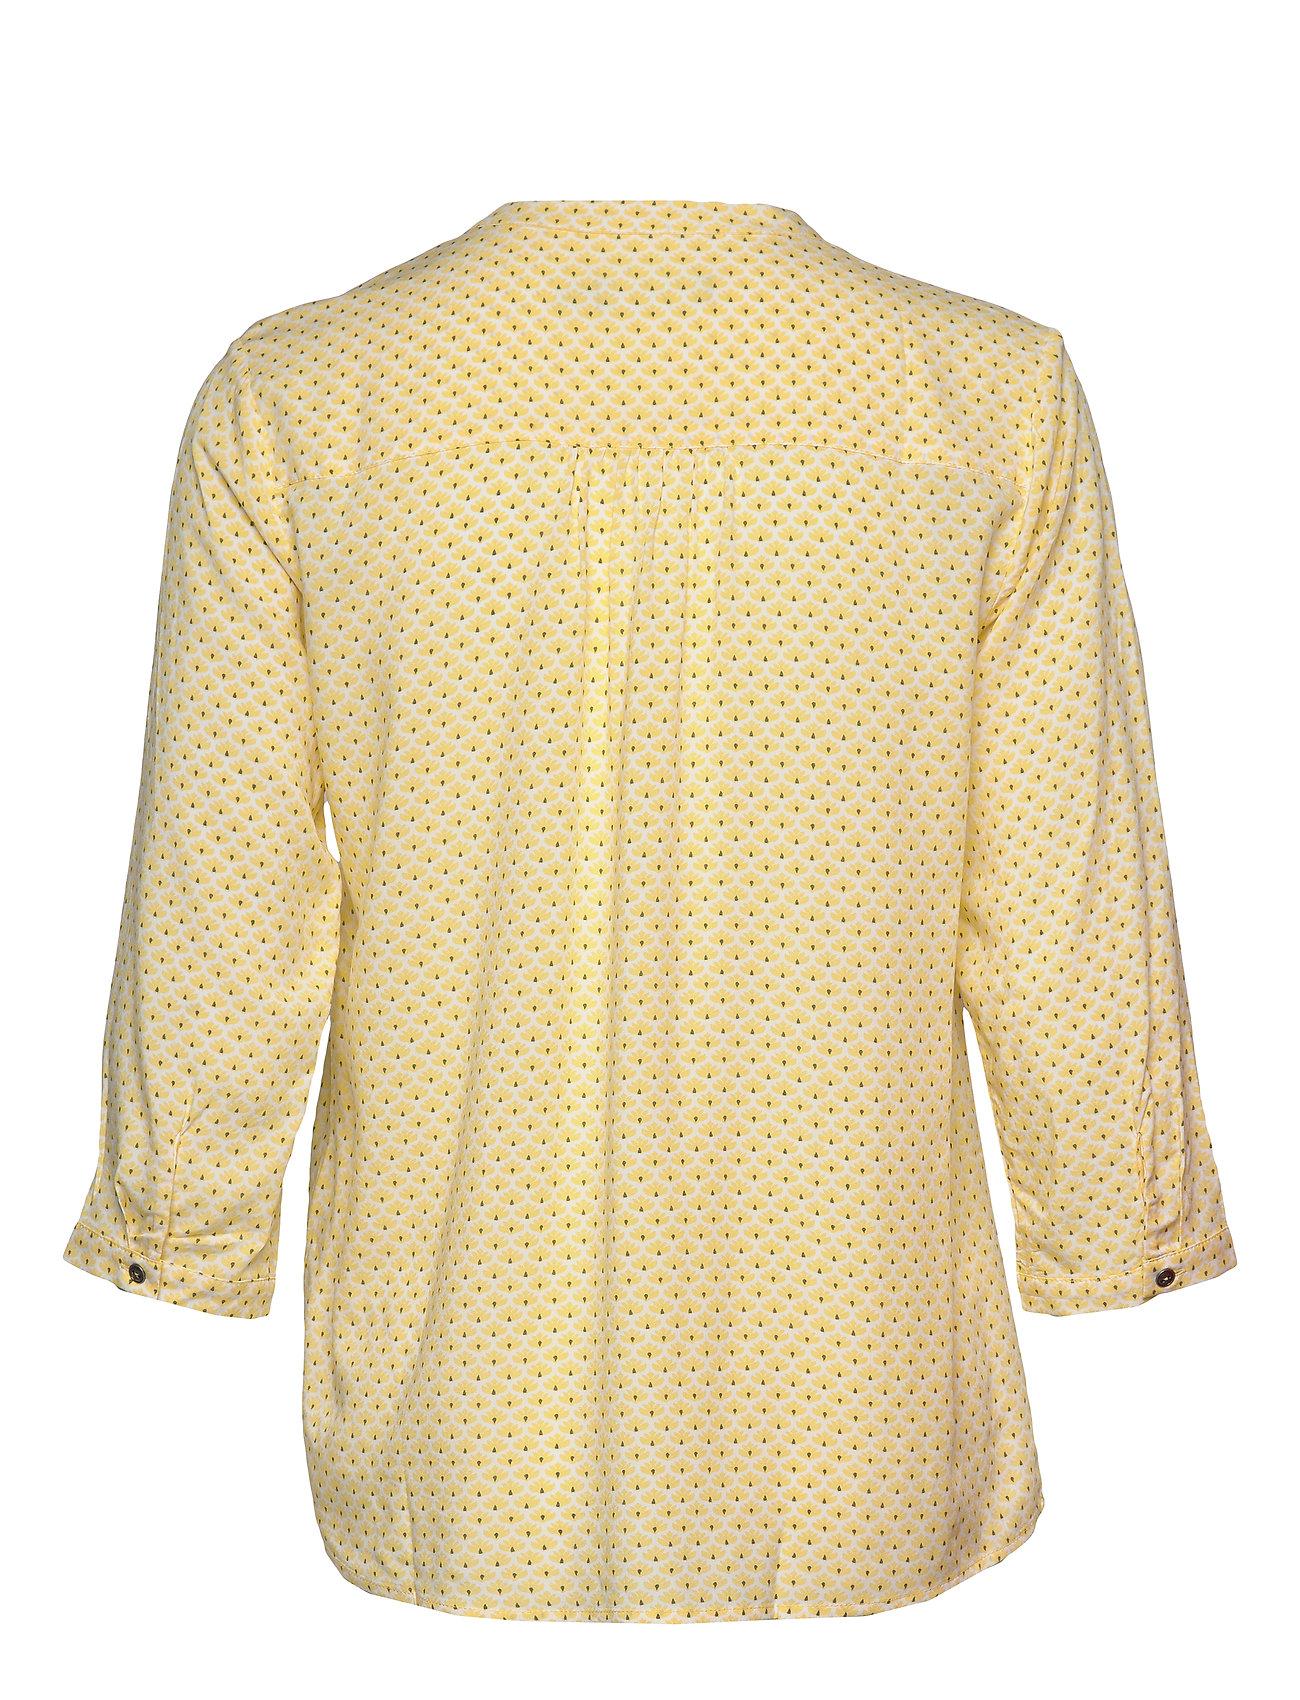 Fransa Fripretro 1 Shirt - Blusar & Skjortor